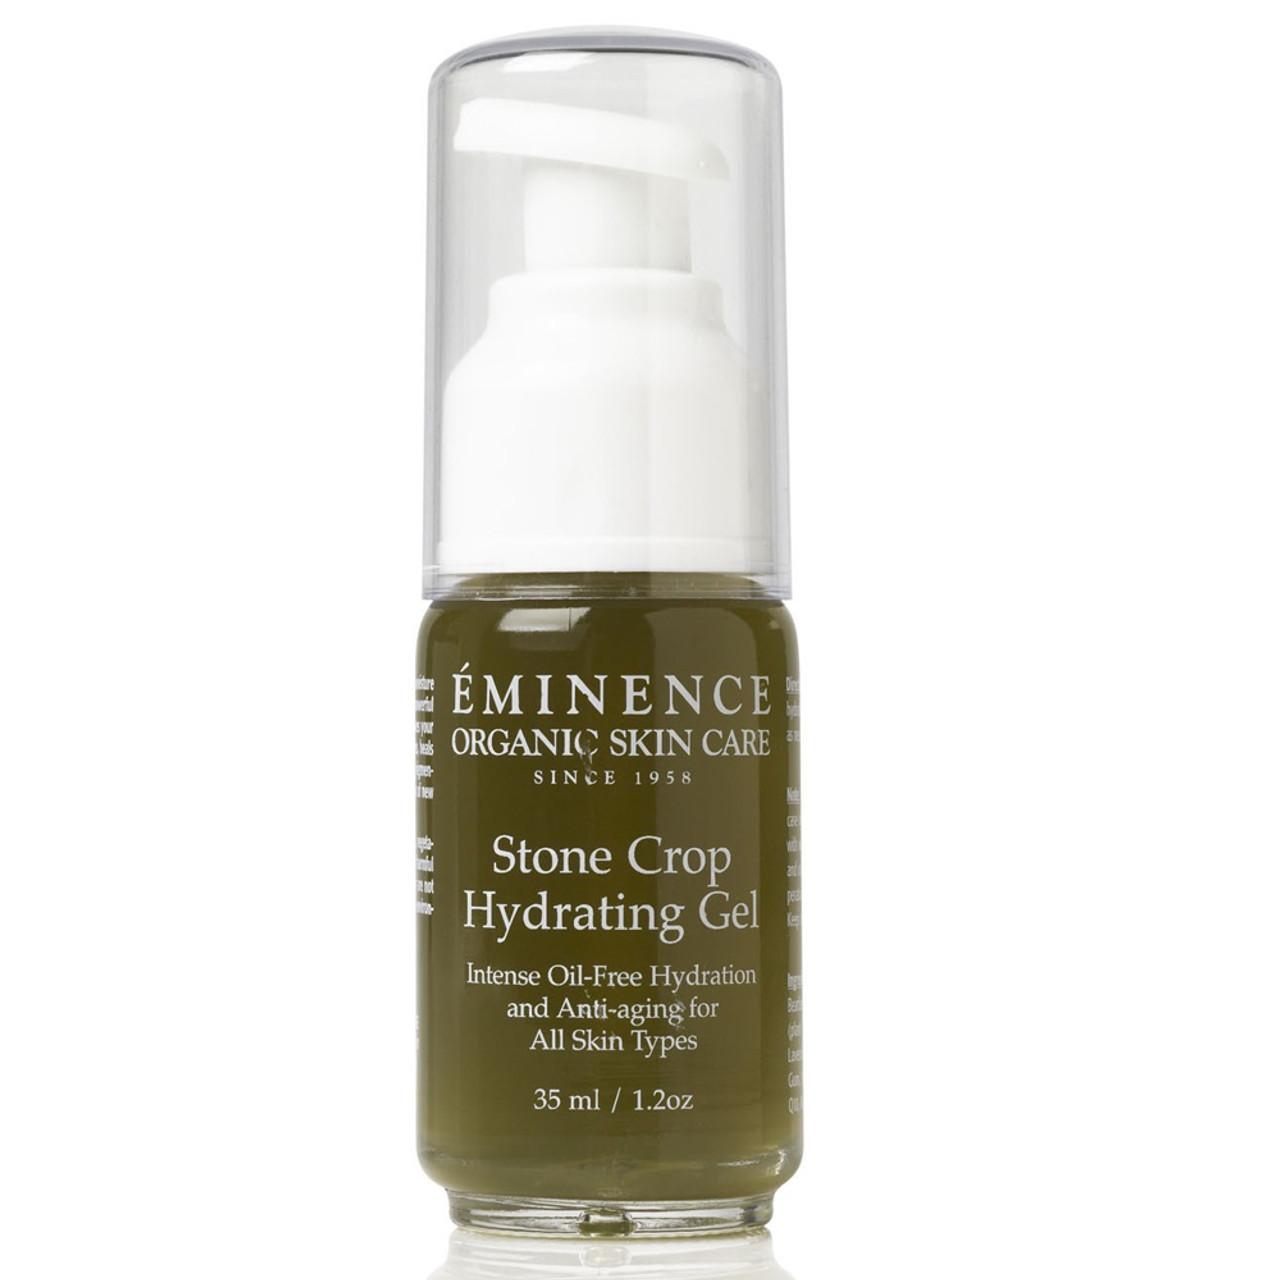 Eminence Stone Crop Hydrating Gel BeautifiedYou.com